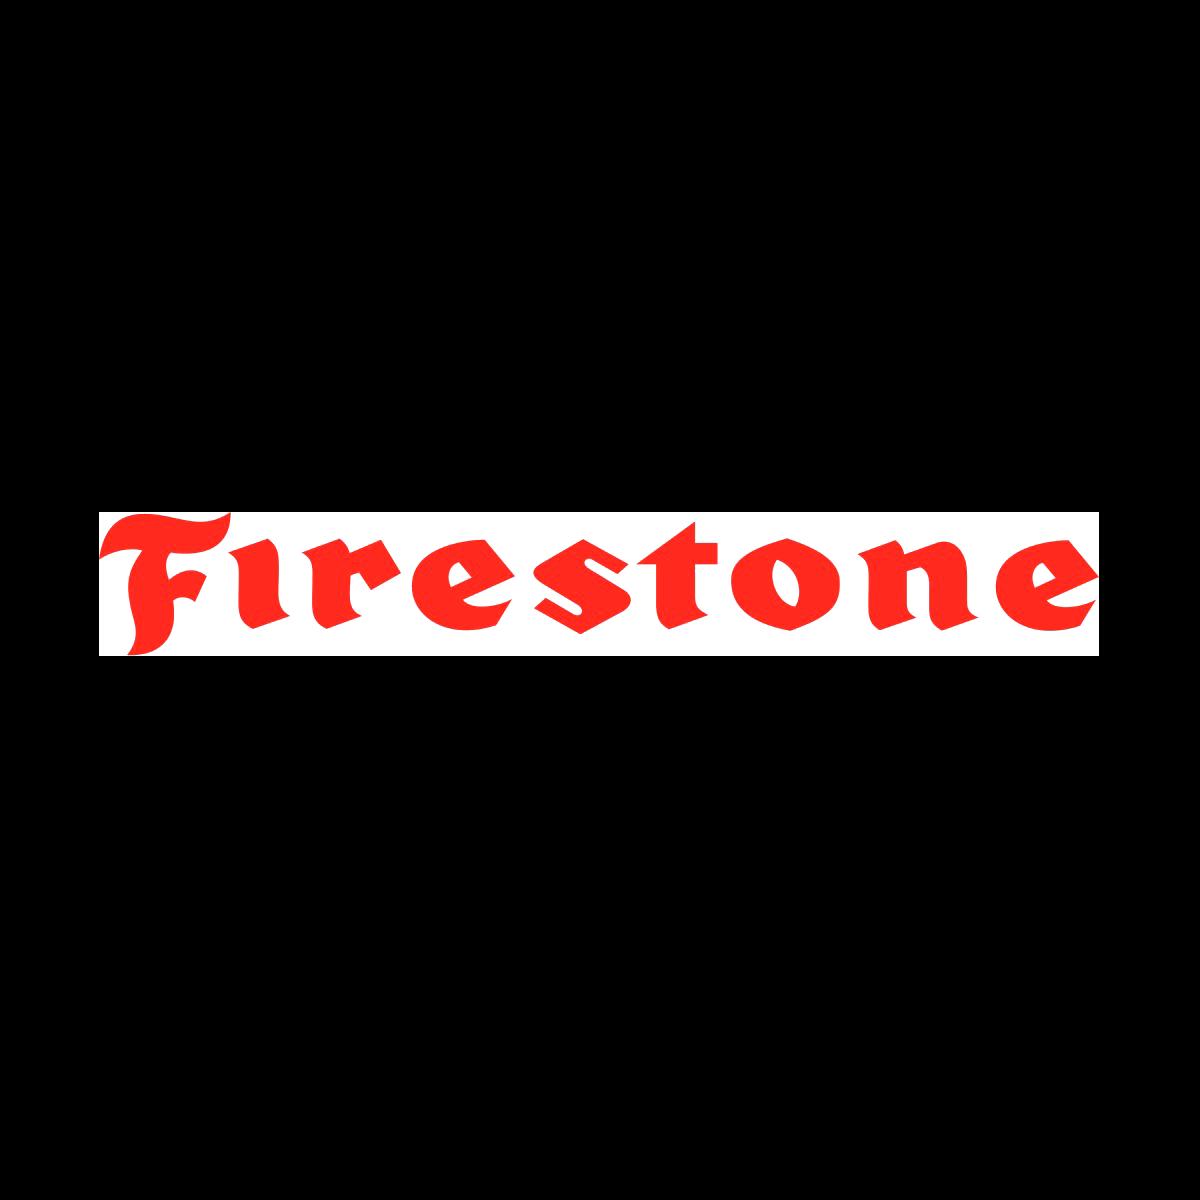 Logo Firestone02